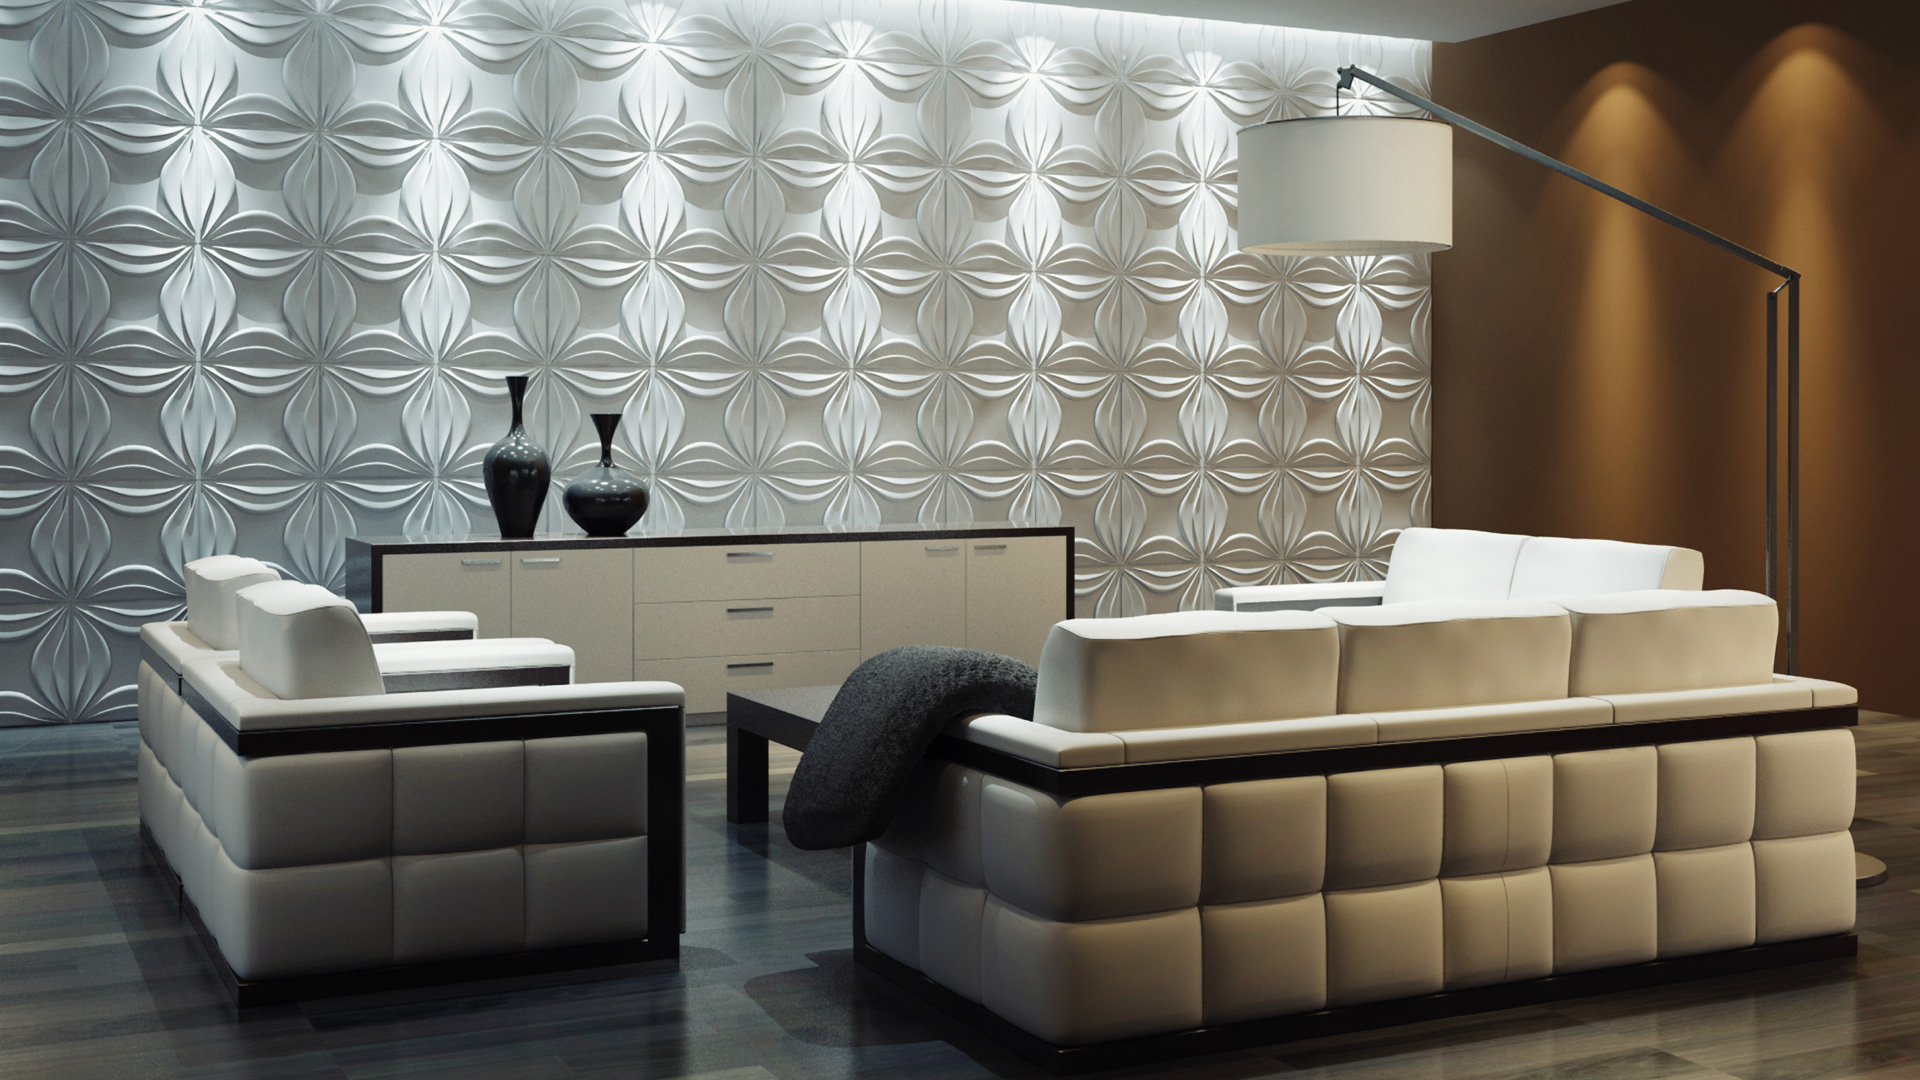 3D Wandpaneele - Produkte - Lily - Deckenpaneele - 3D Tapeten - Wandverkleidung